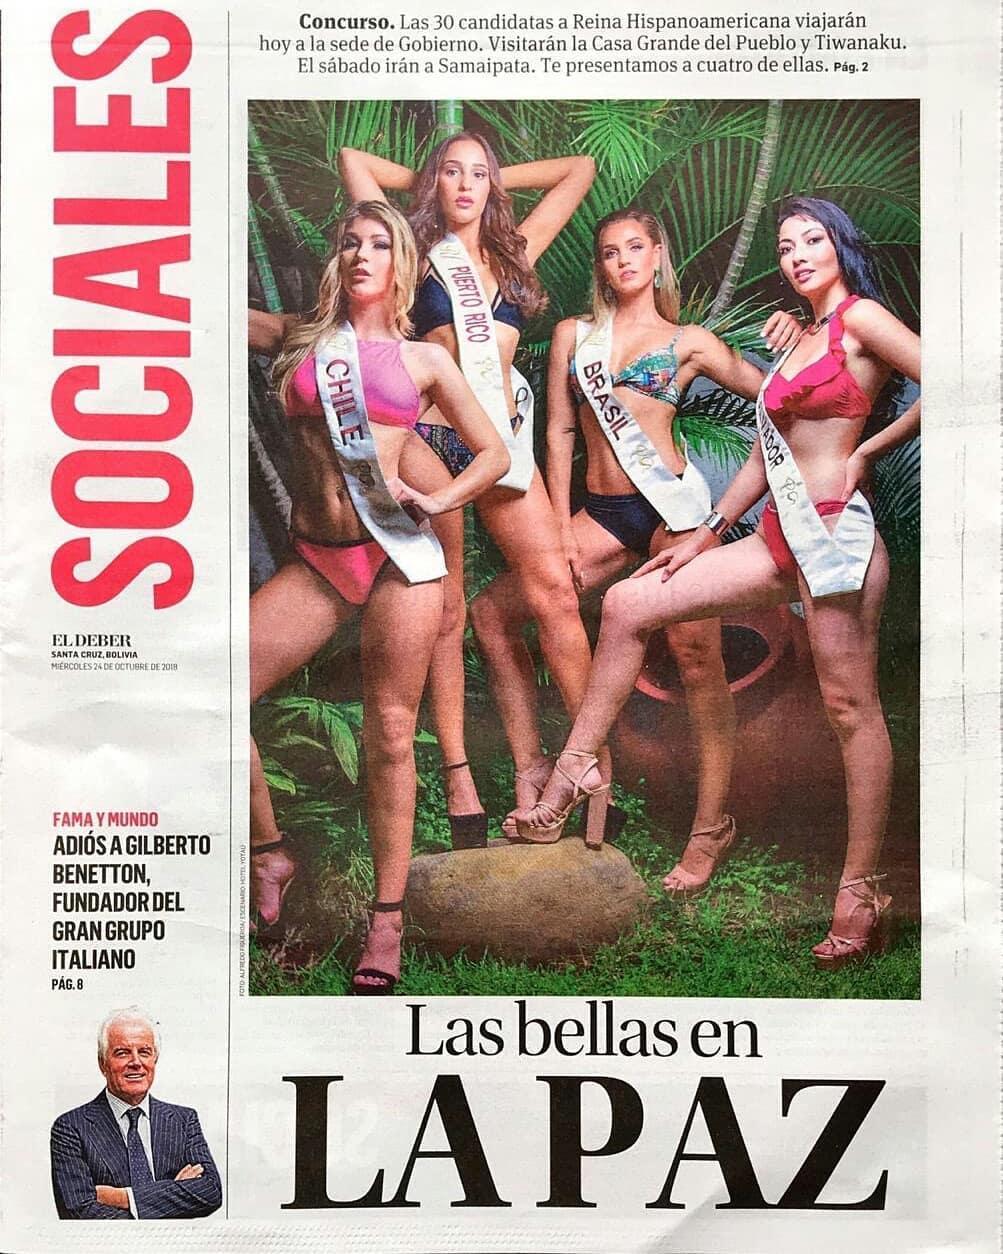 isabele pandini nogueira, miss grand rio de janeiro 2019/vice de reyna hispanoamericana 2018/top 4 de miss global beauty queen 2016. - Página 4 43817811